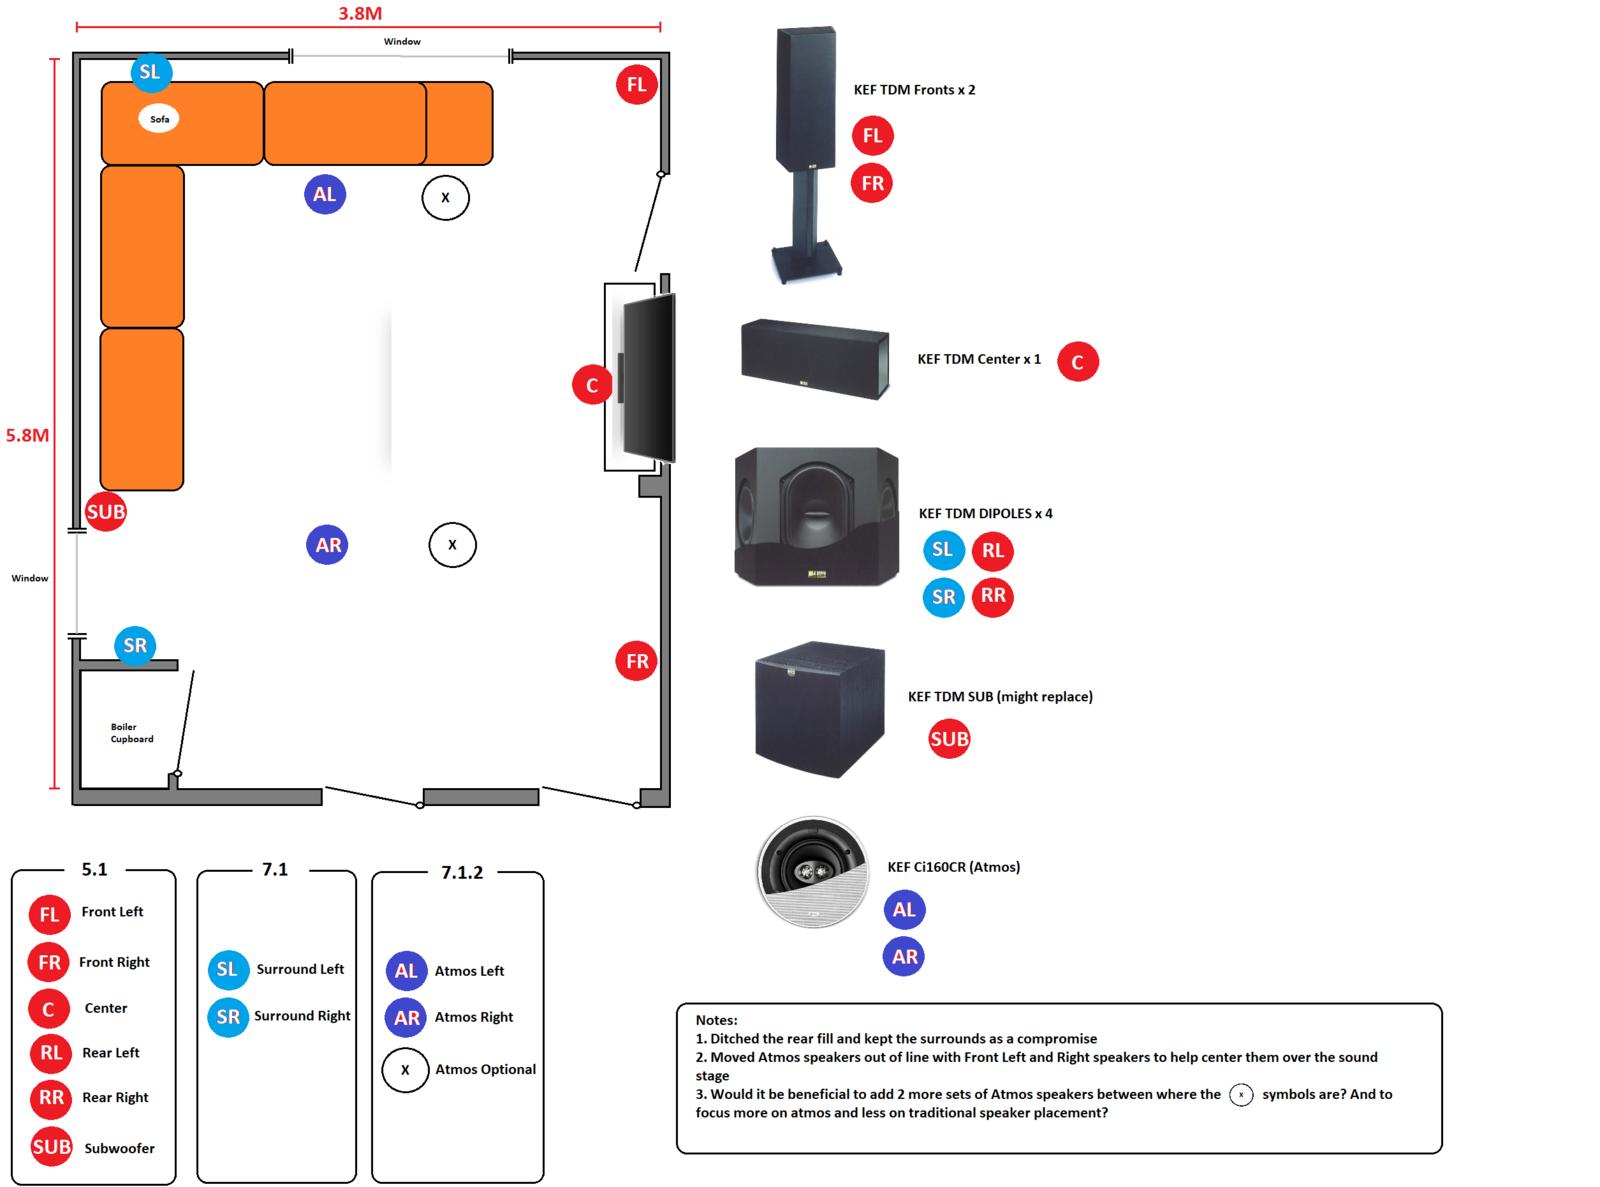 living room plan (5.1.2 -alternative-optimized).png